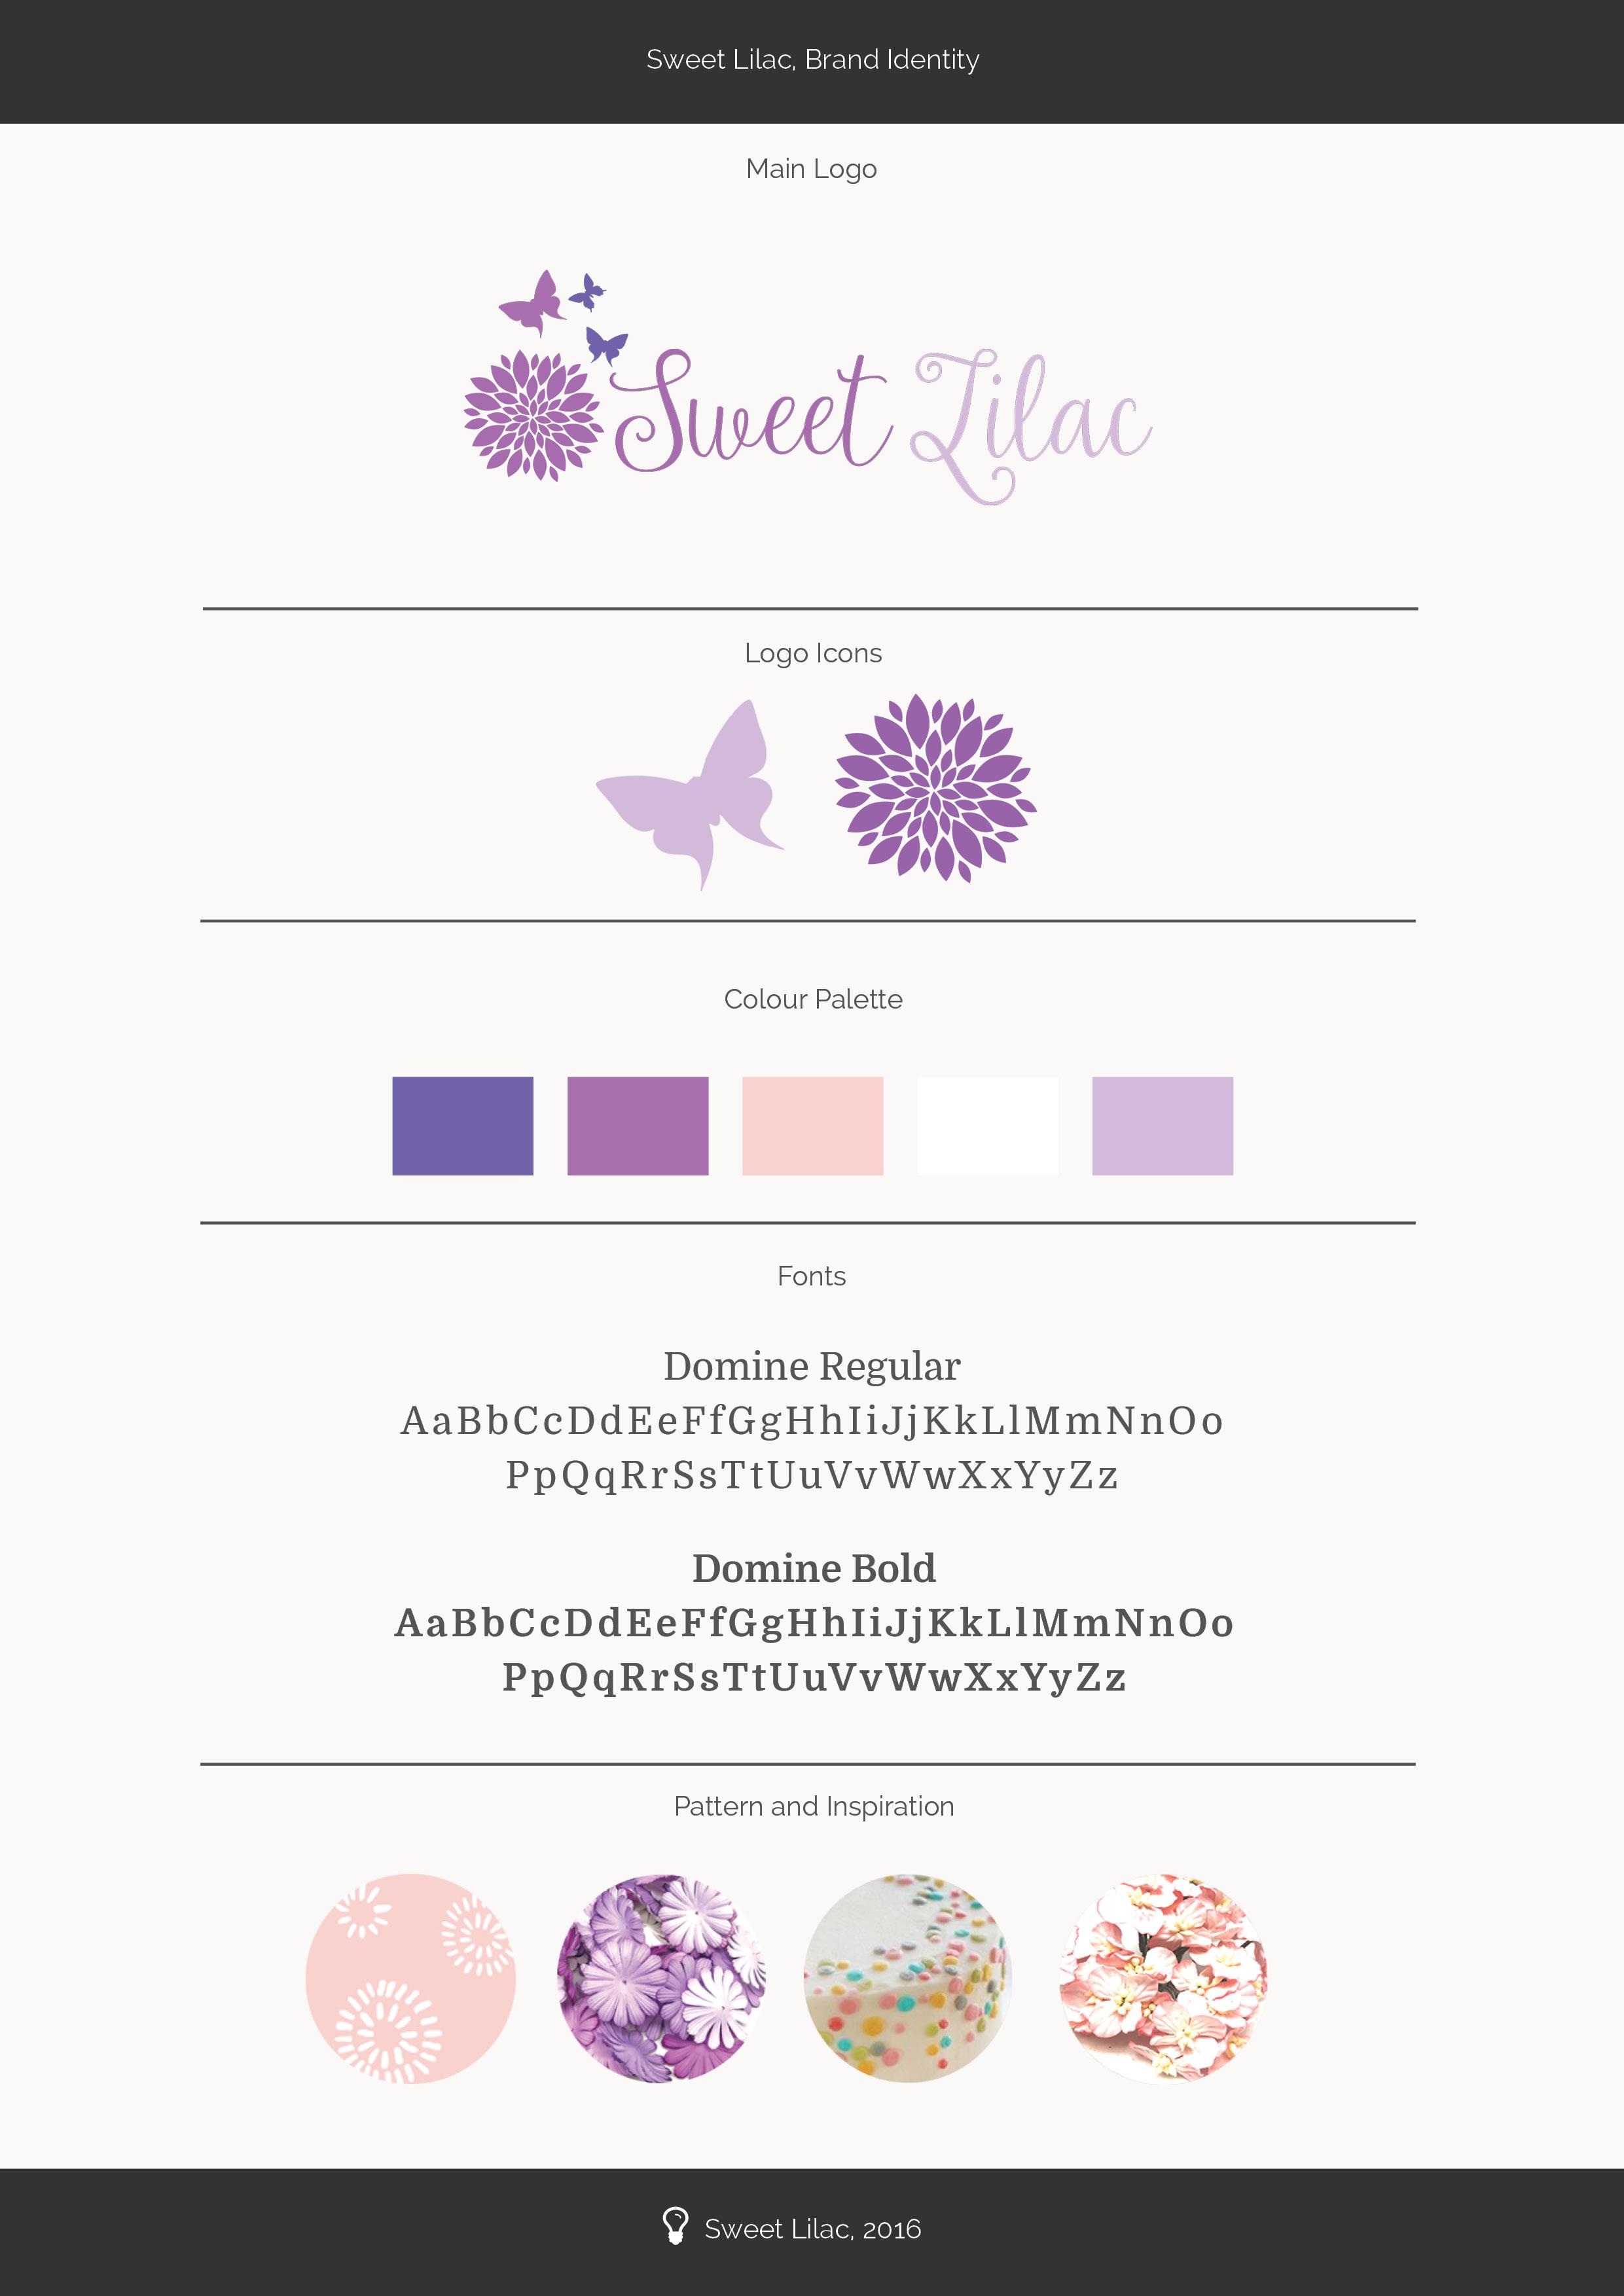 Sweet Lilac Brand Identity